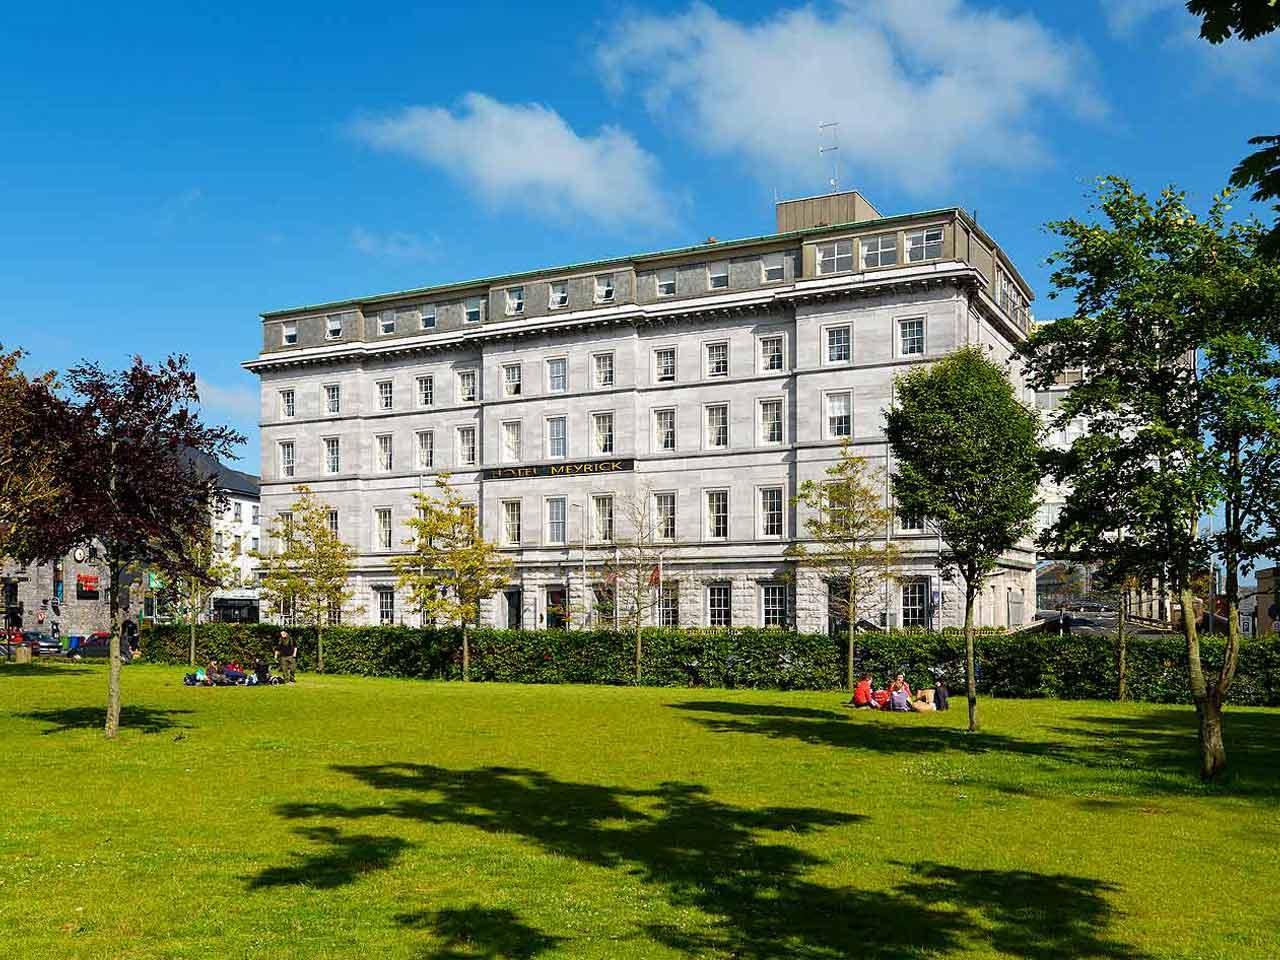 Hotel Meyrick Galway.jpg